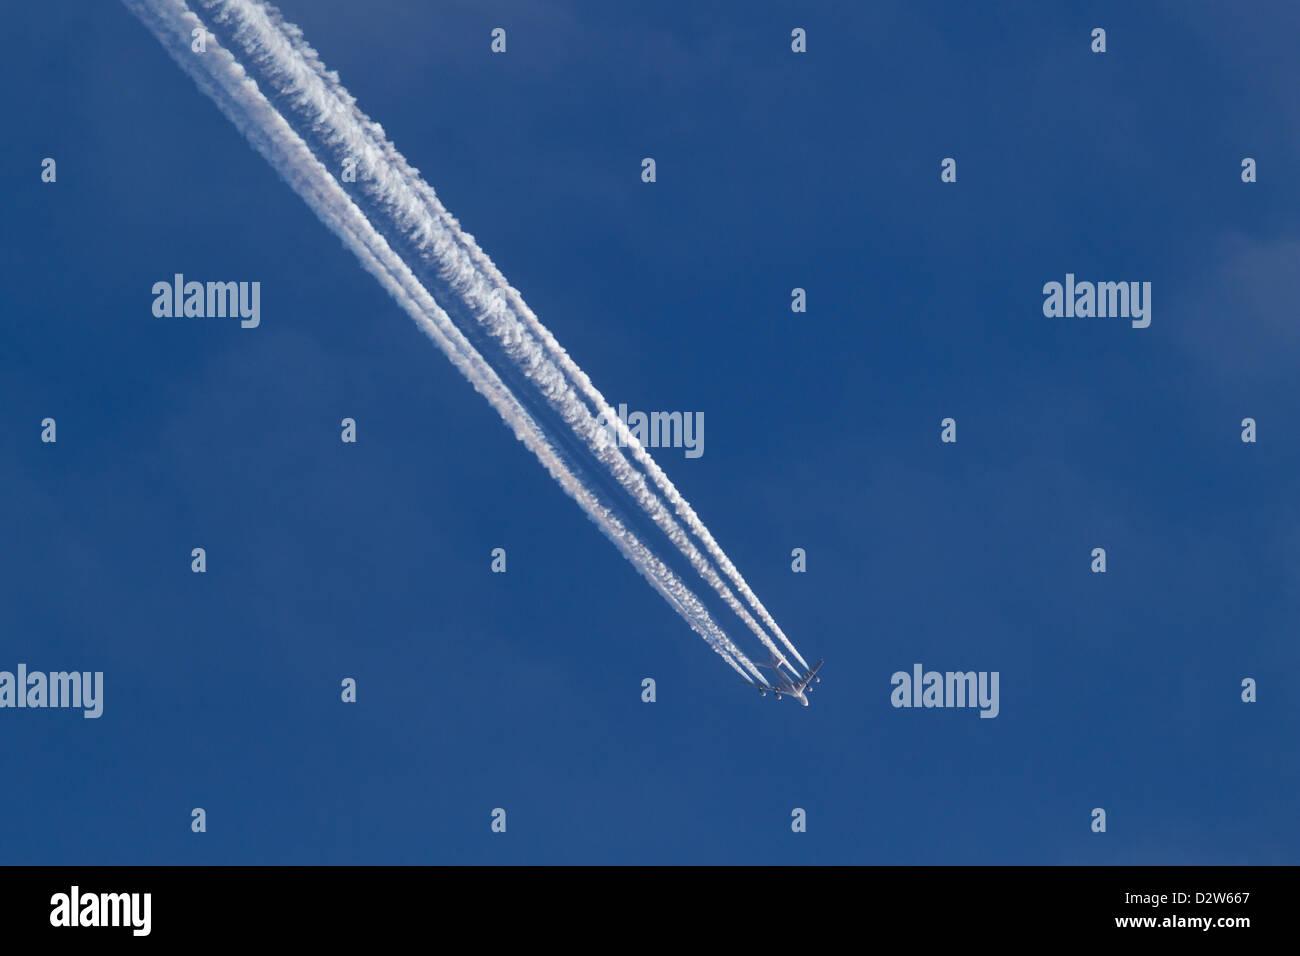 Jet plane with vapor trails - Stock Image